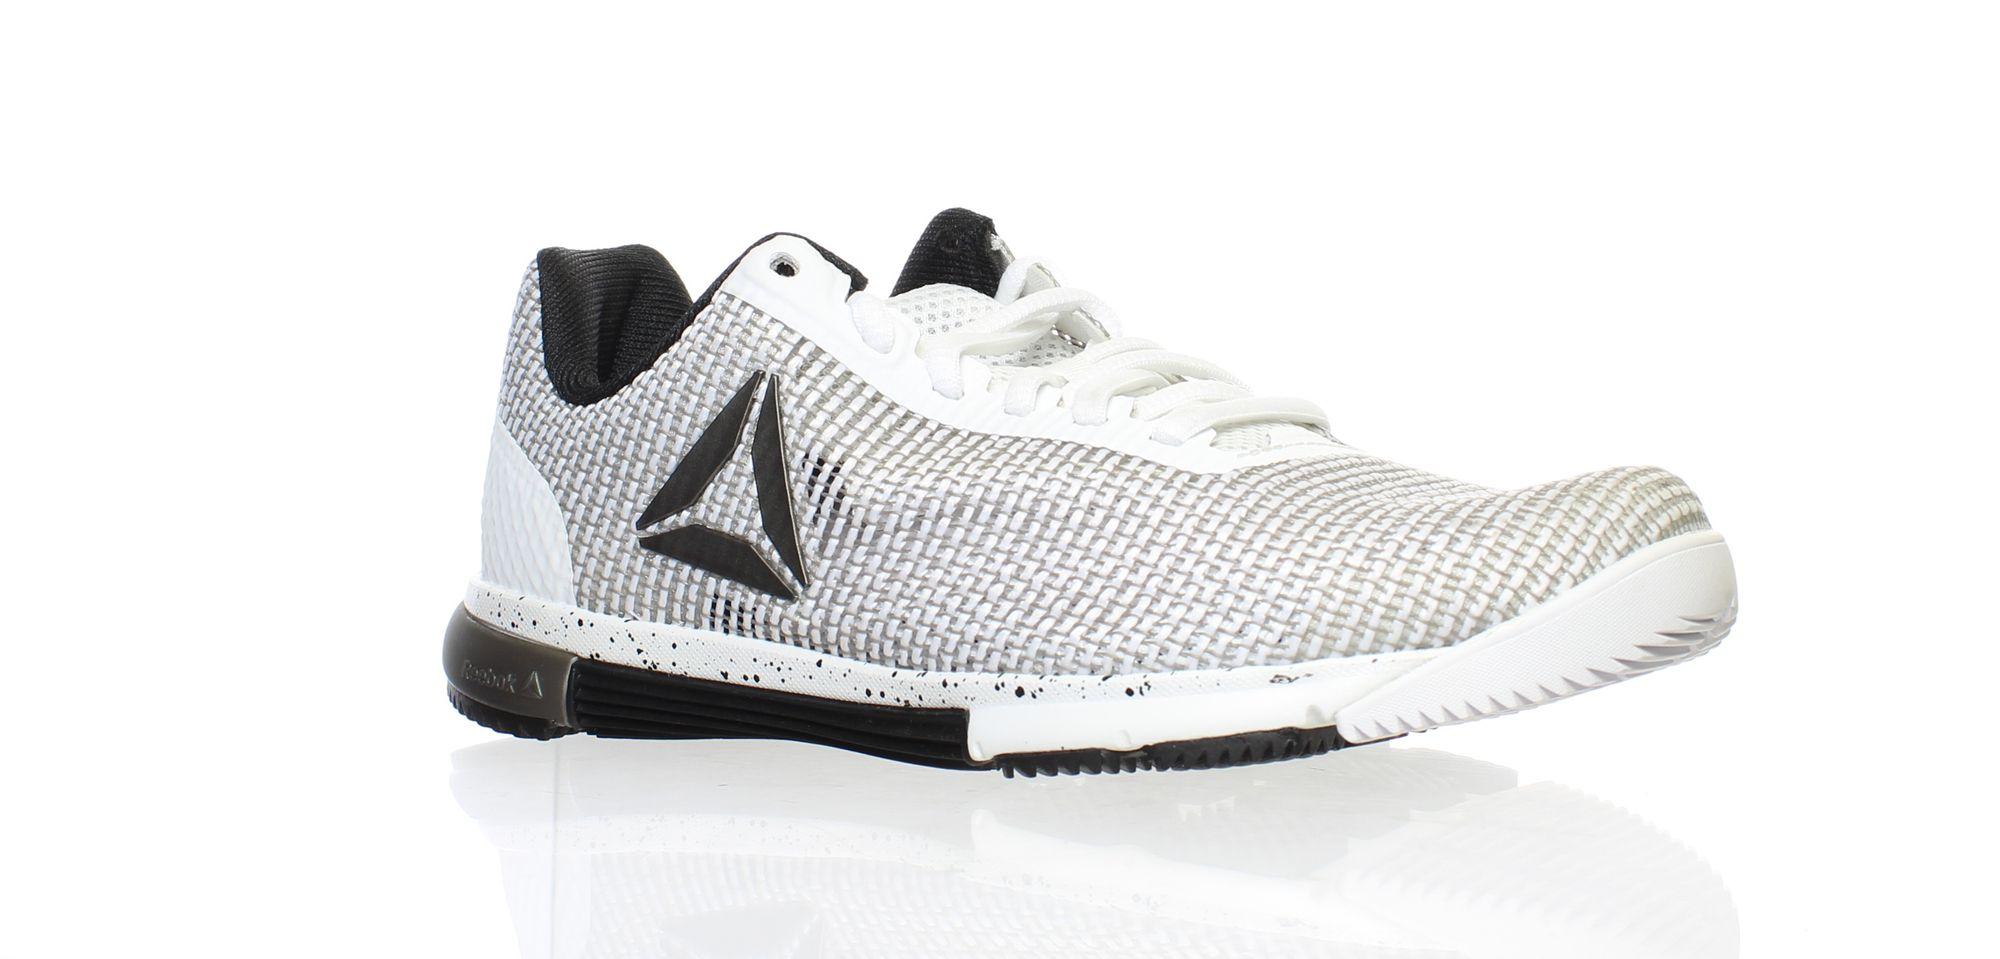 Reebok-Mens-Athletic-Speed-TR-Flexweave-Cross-Training-Shoes thumbnail 10